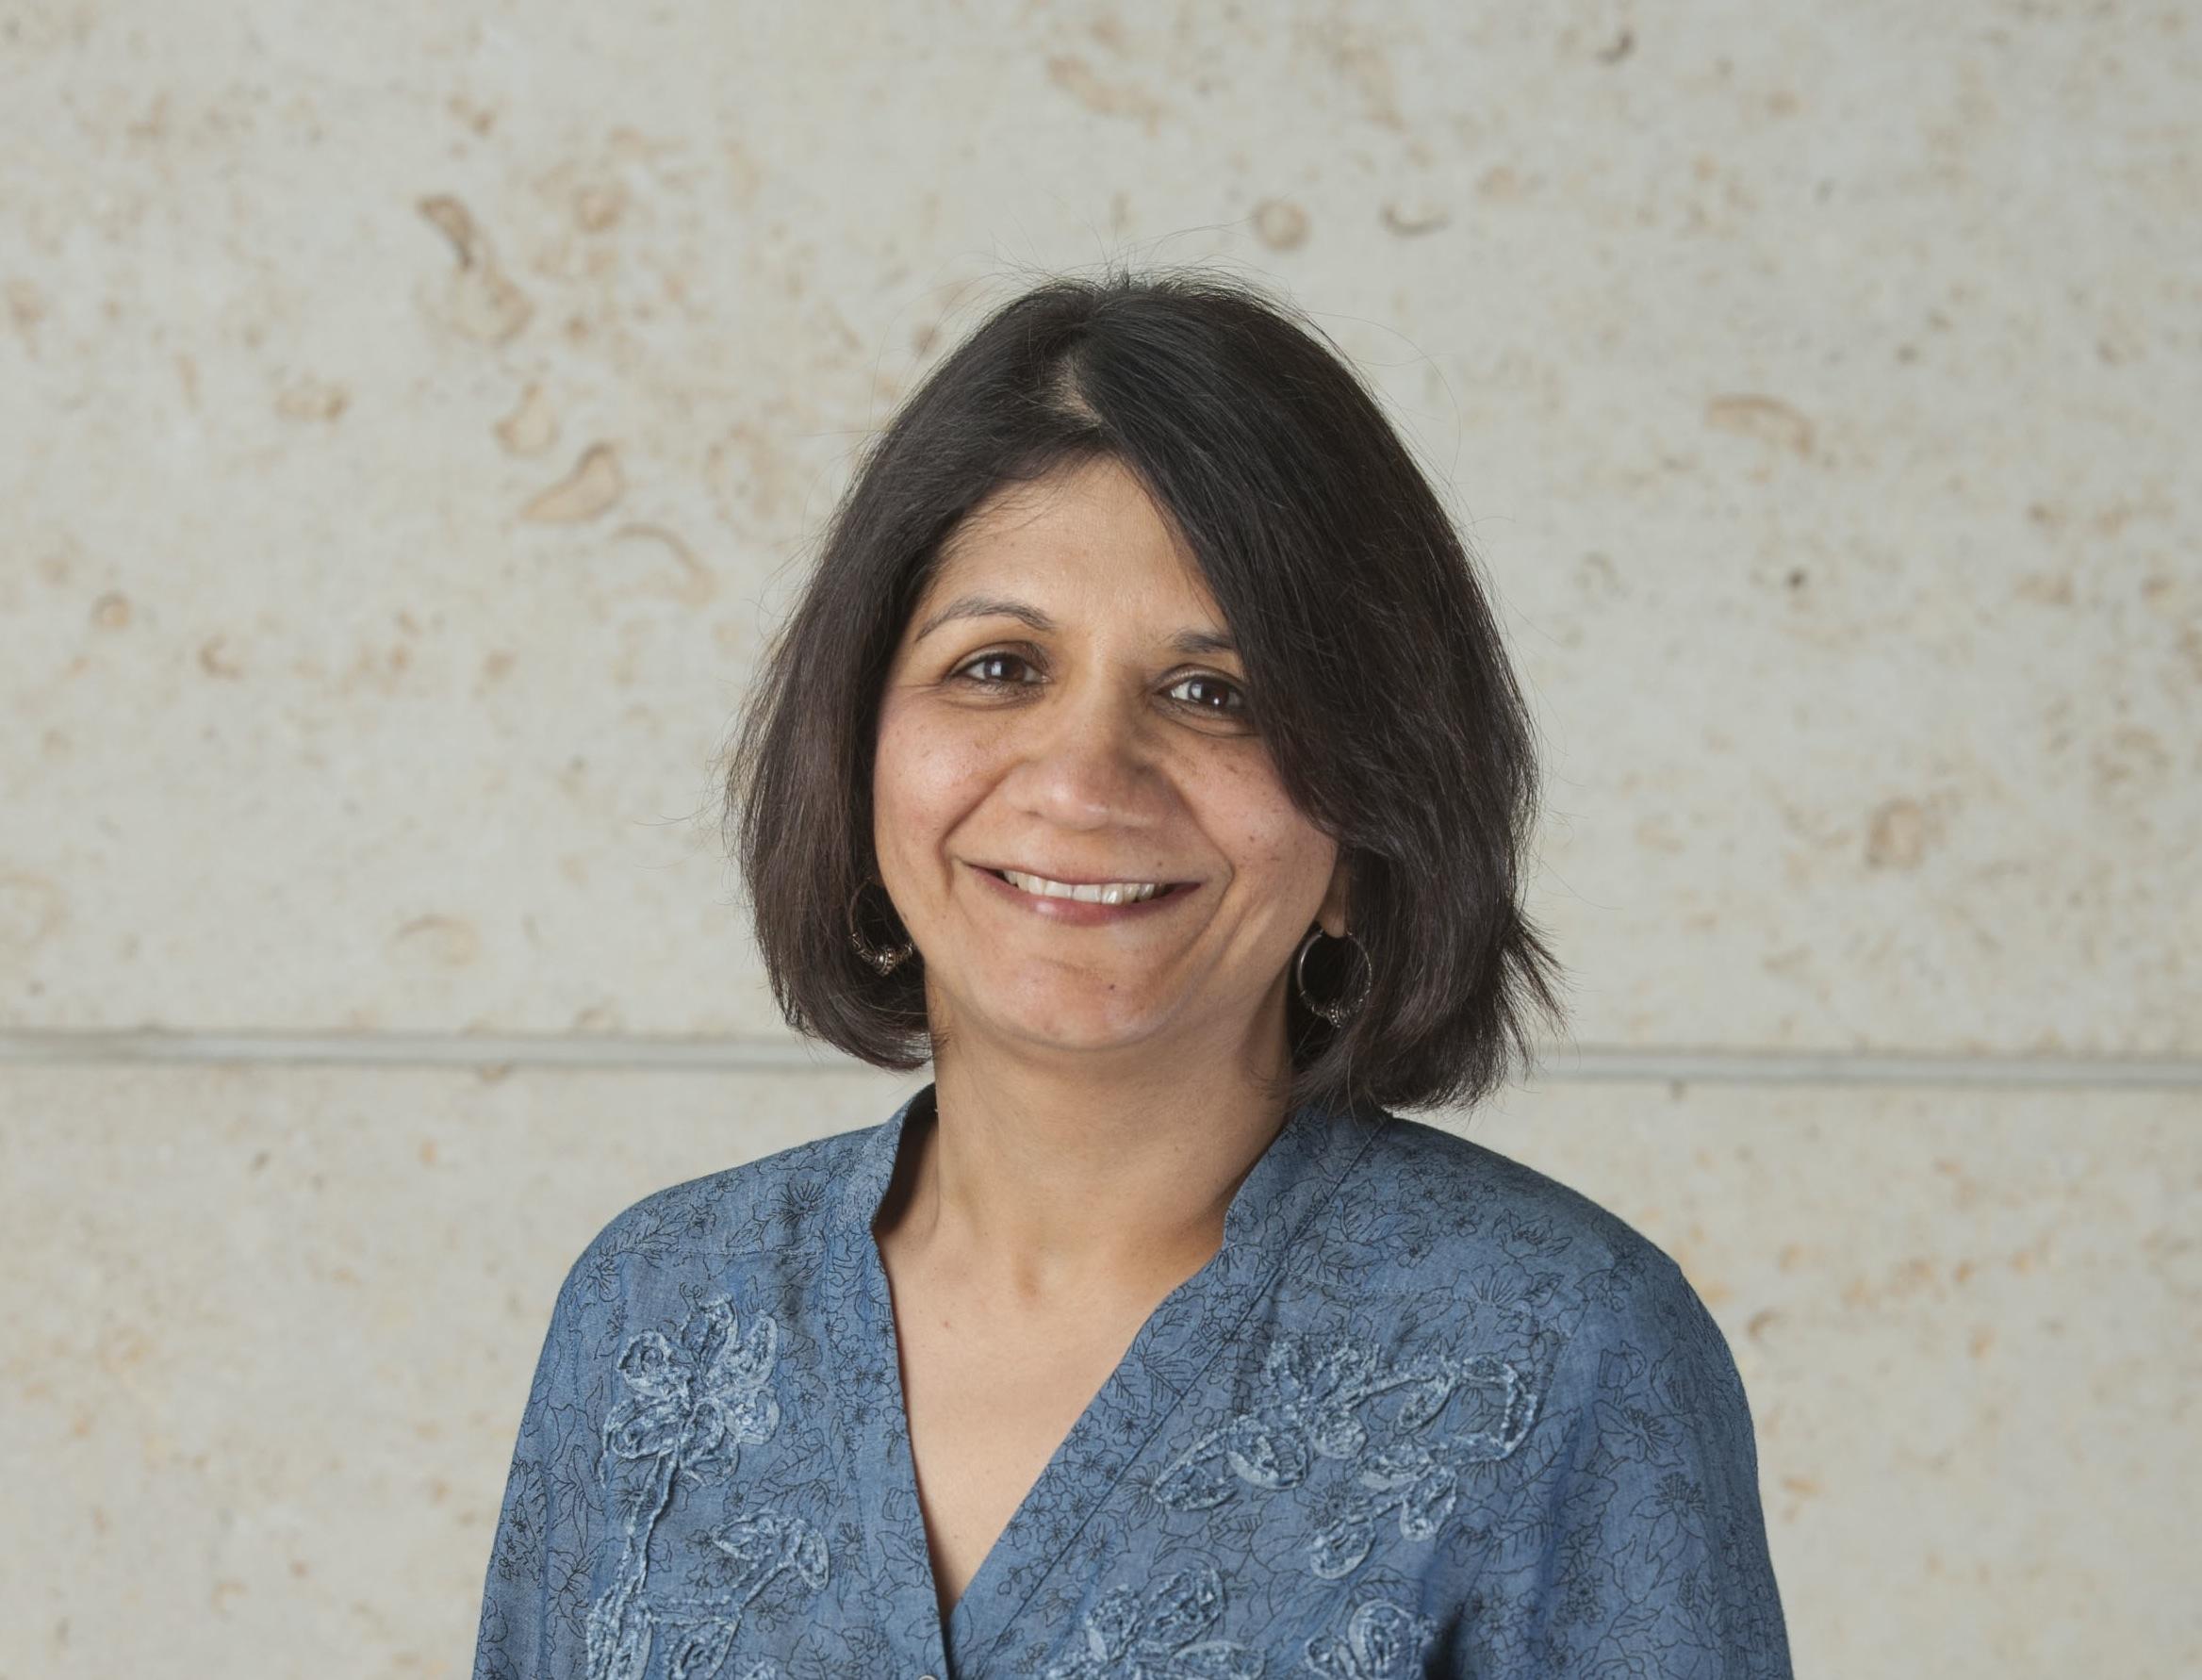 Amita Sehgal